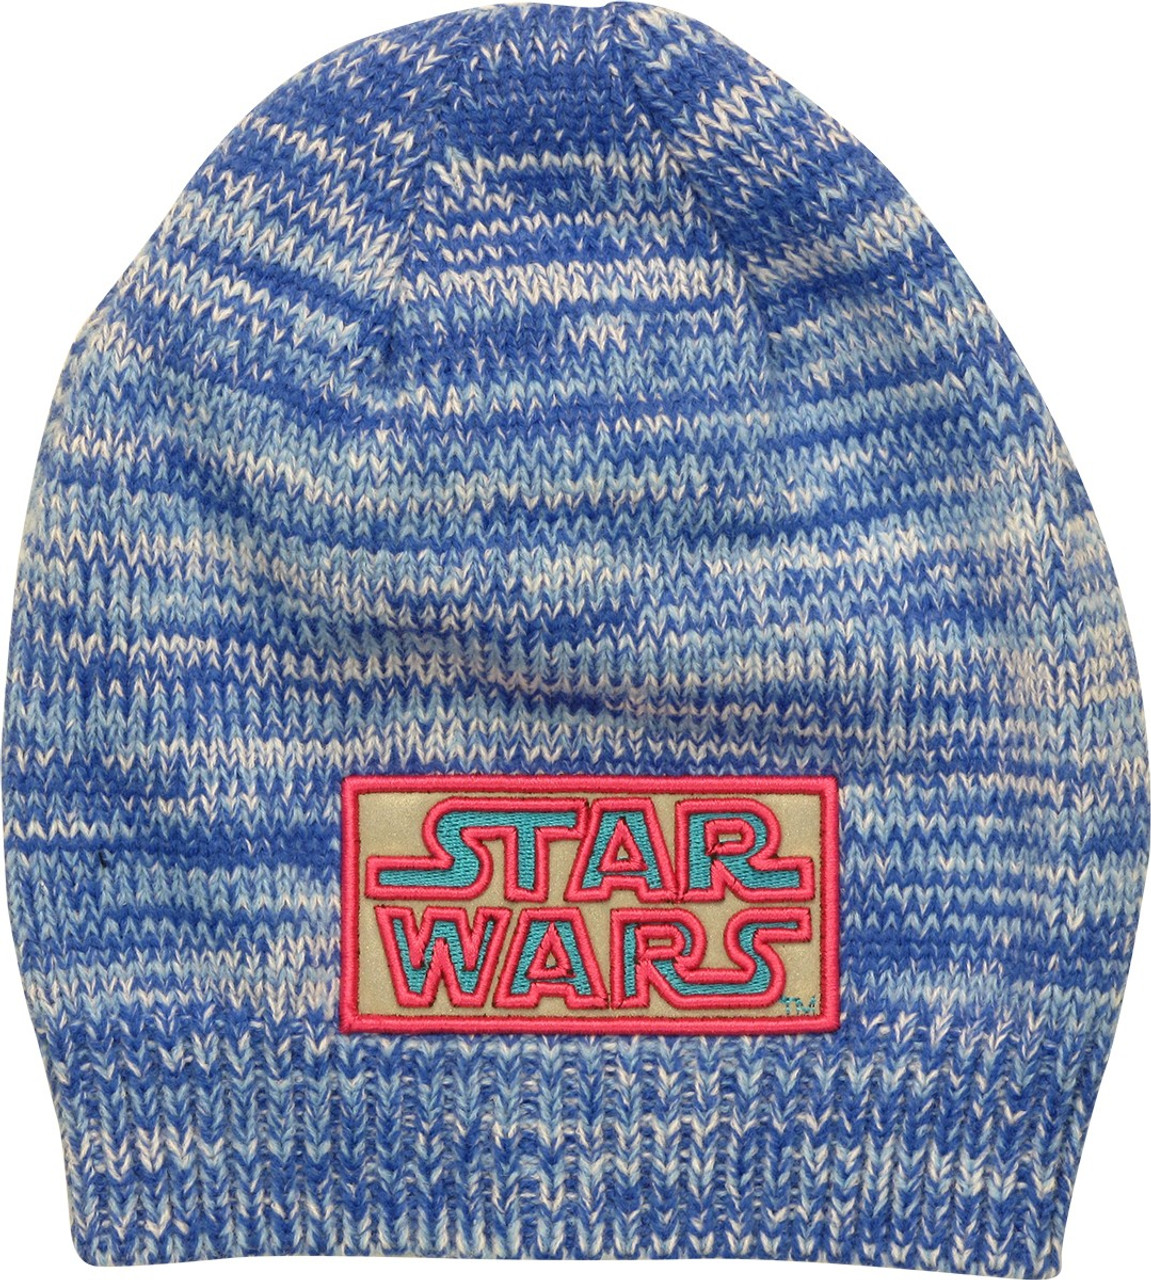 4ce1761f1ee star-wars-logo-marled-blue-beanie-14  29461.1512281816.jpg c 2 imbypass on